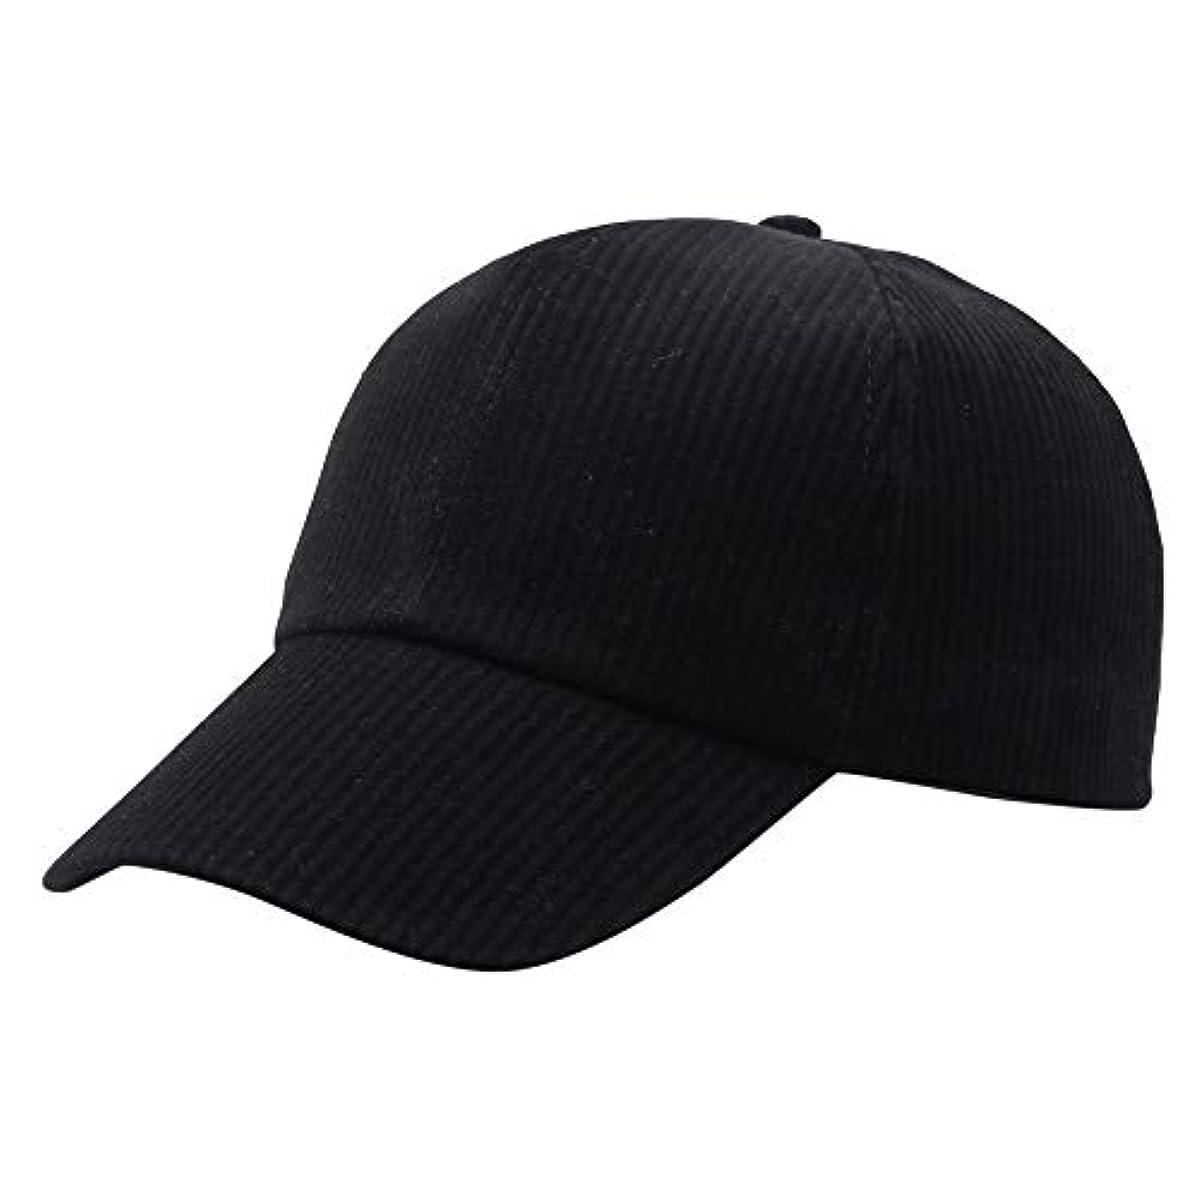 Racazing Cap コーデュロイ 野球帽 迷彩 夏 登山 通気性のある メッシュ 帽子 ベルクロ 可調整可能 ストライプ 刺繍 棒球帽 UV 帽子 軽量 屋外 Unisex Hat (B)